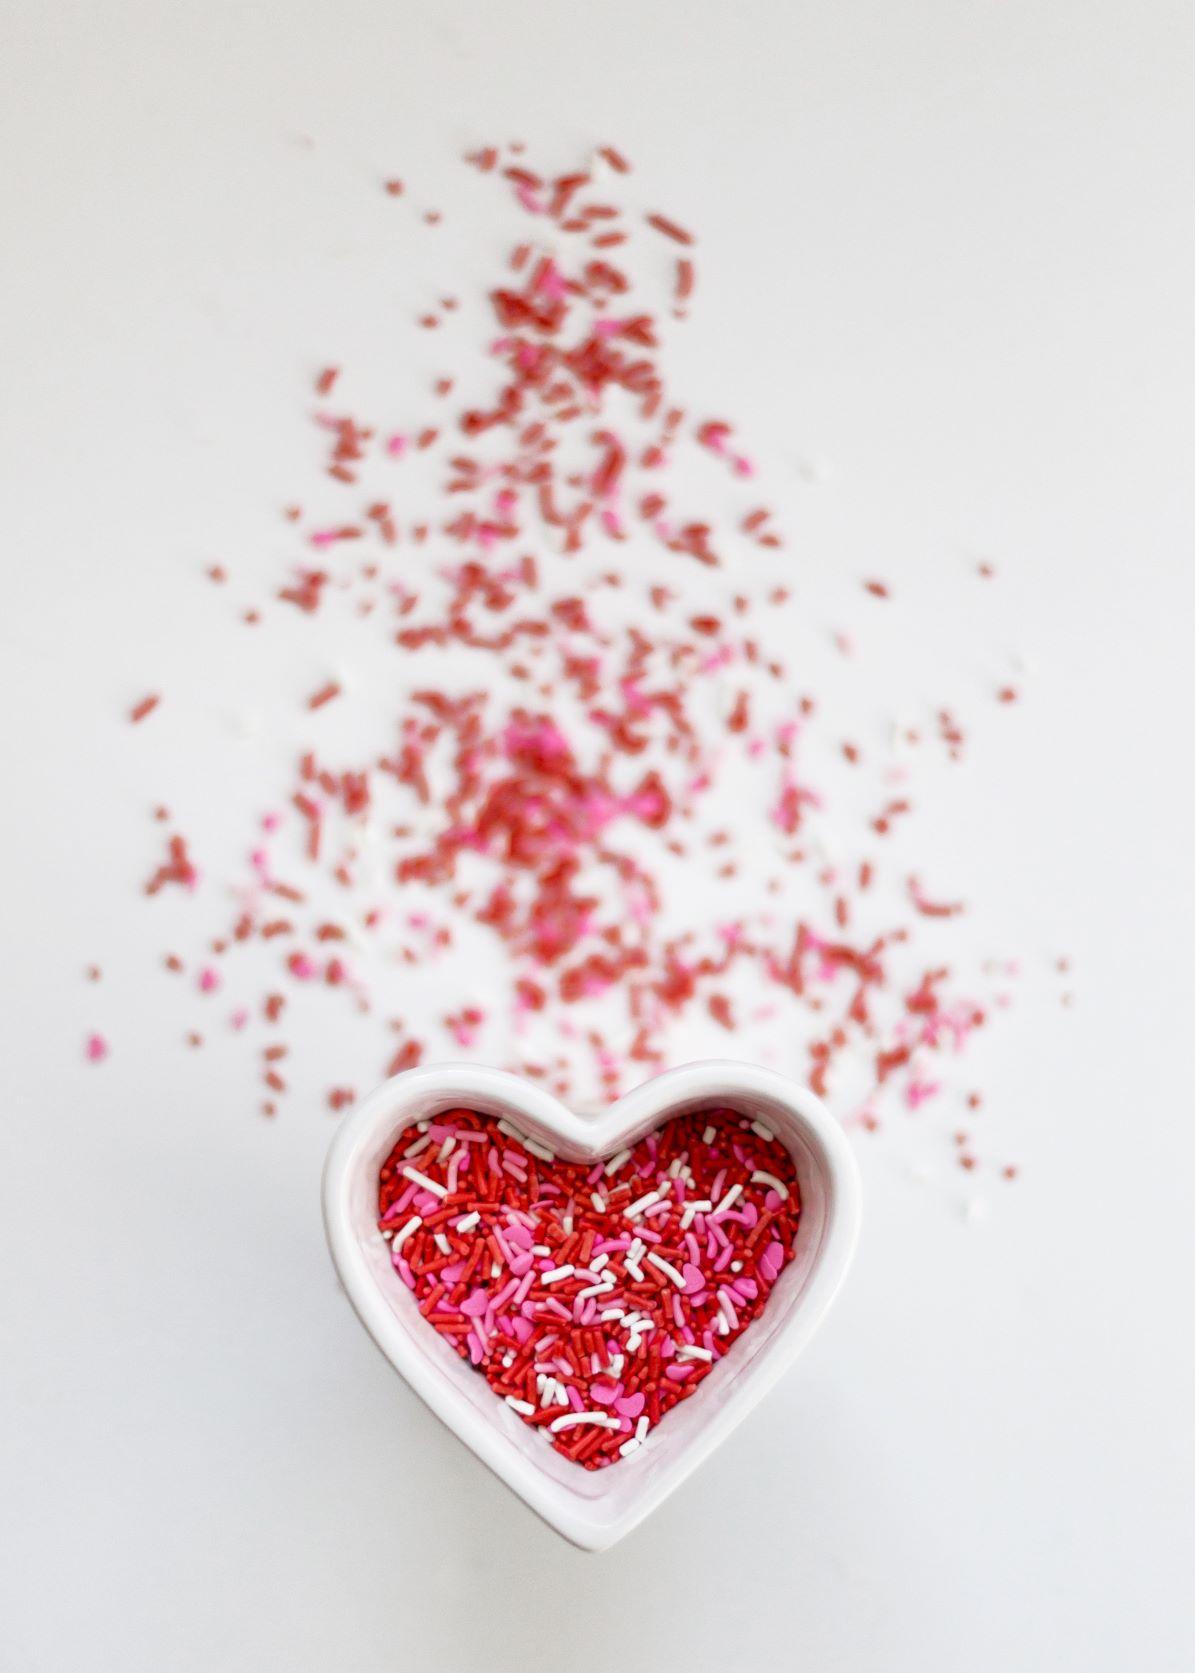 Heart Health // by Casey Gordon